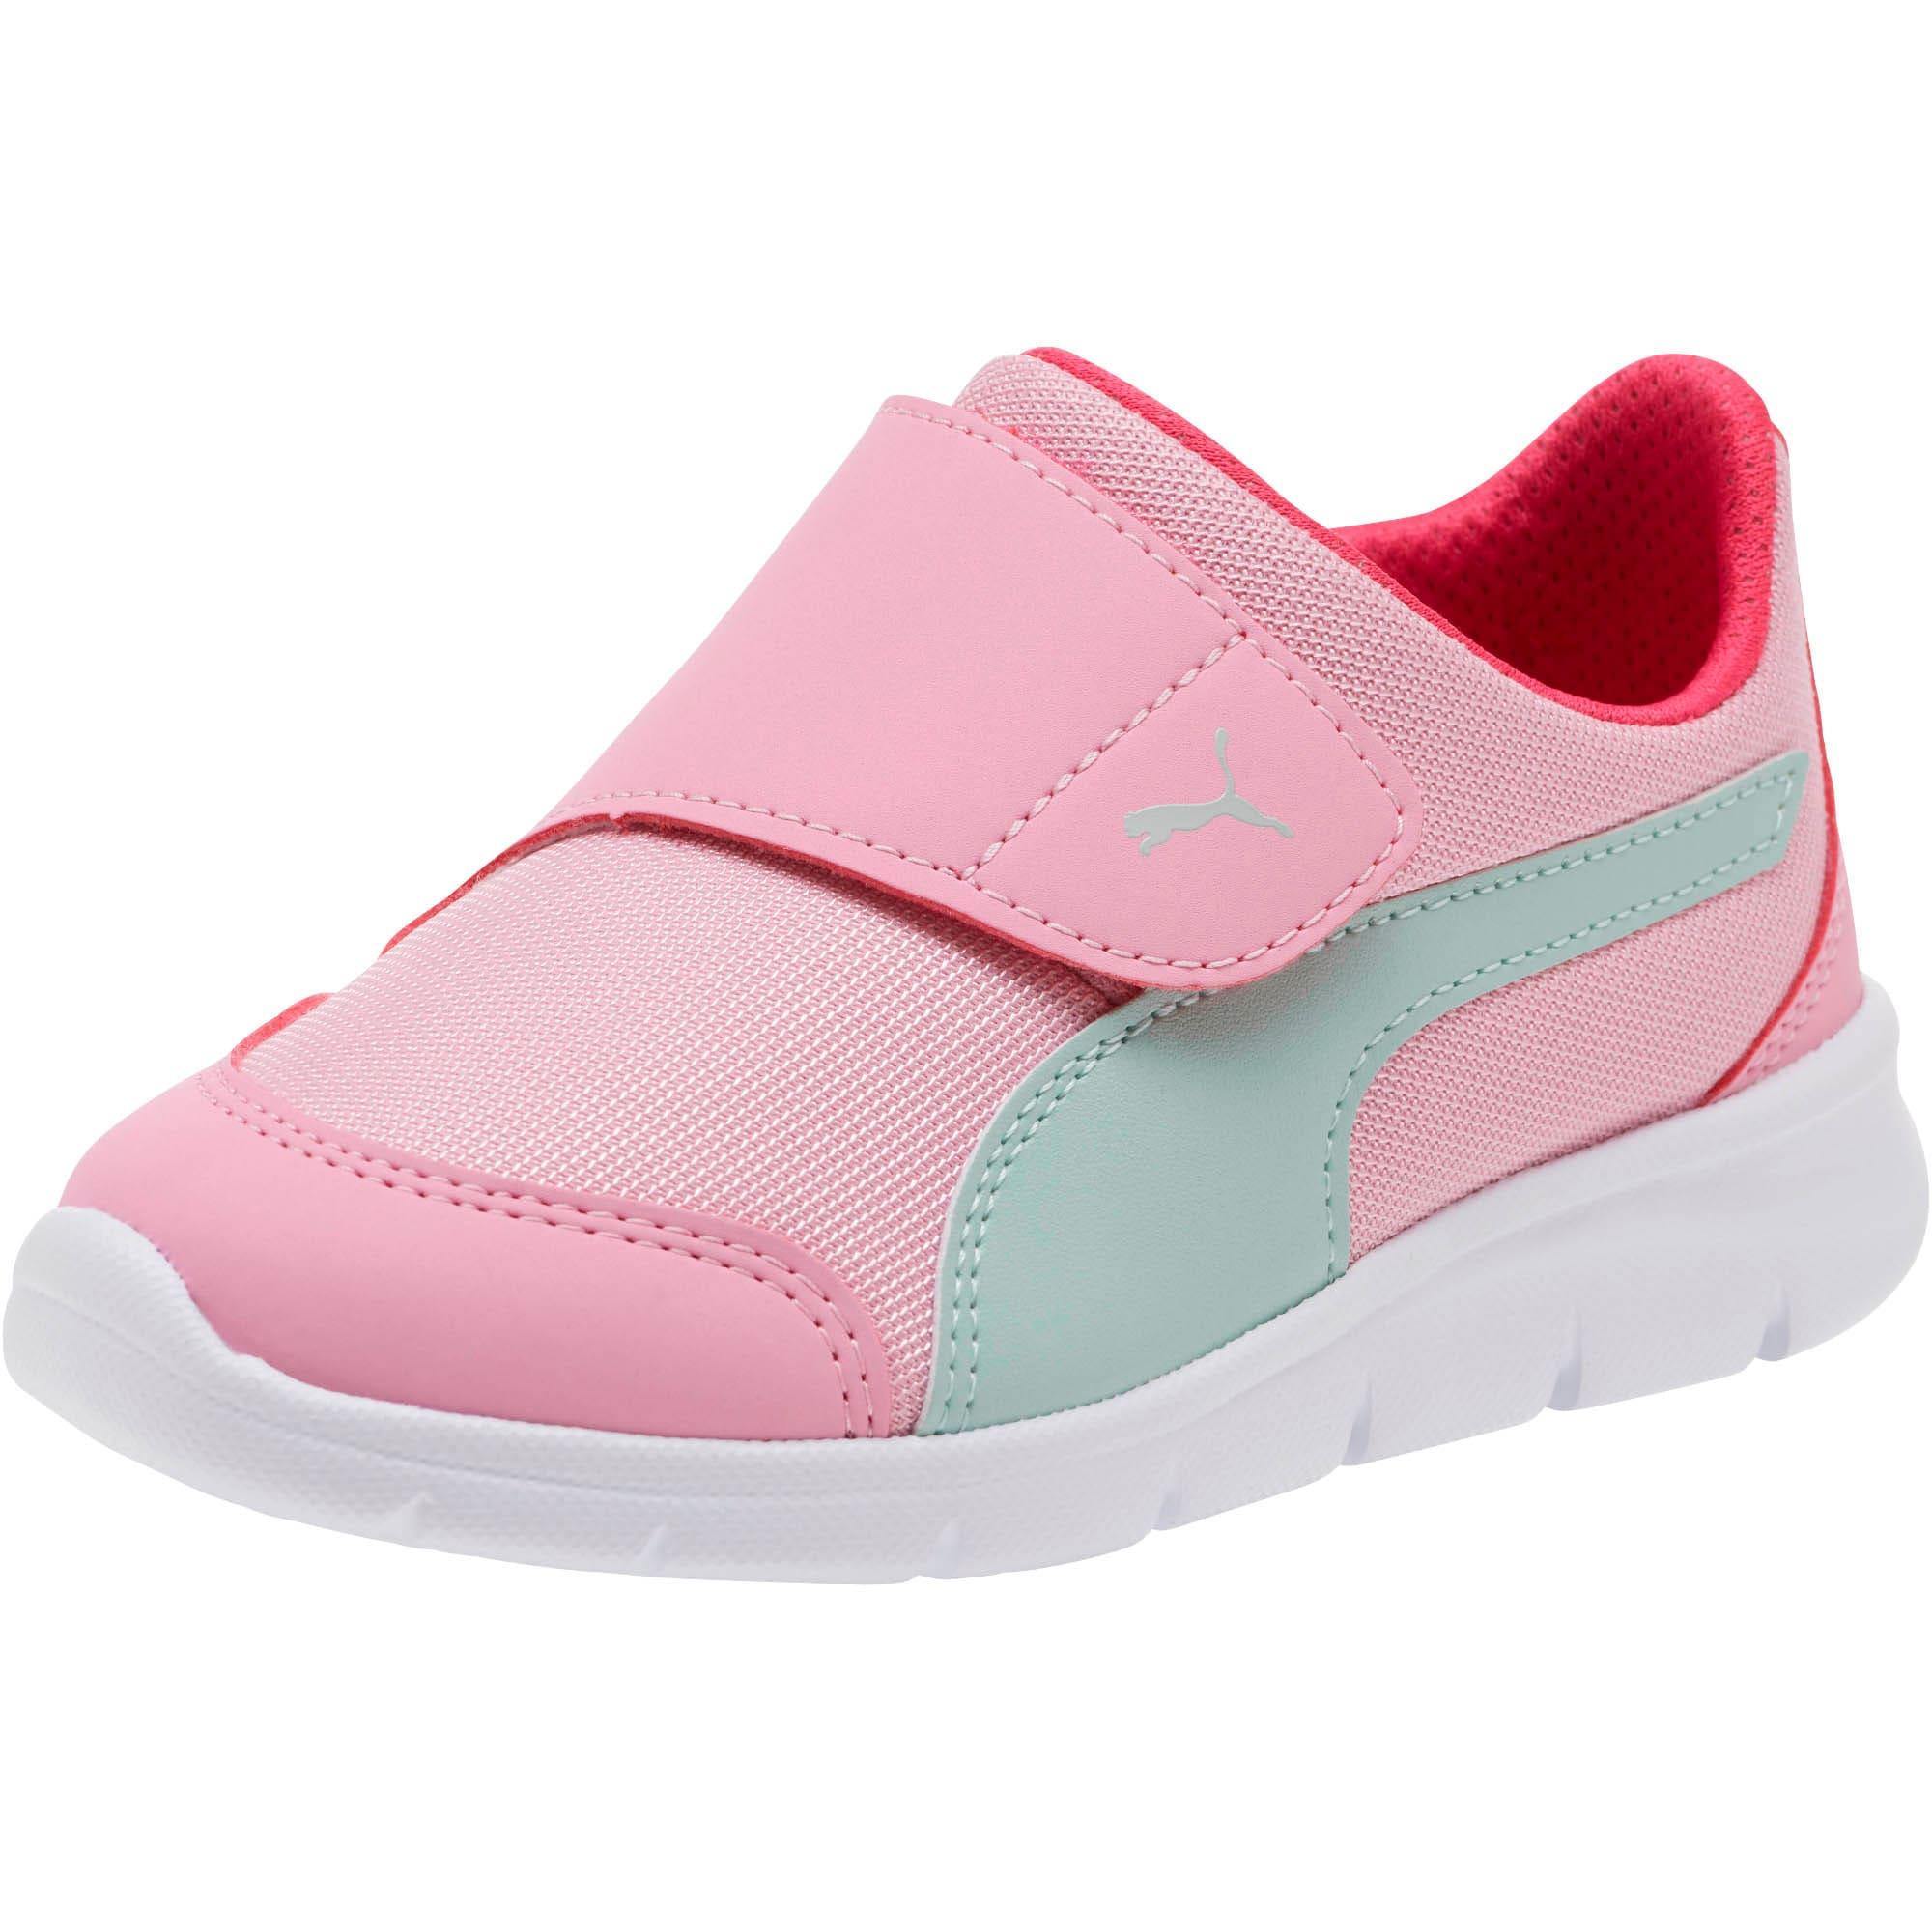 Thumbnail 1 of Bao 3 AC Little Kids' Shoes, Pale Pink-Fair Aqua-Purple, medium